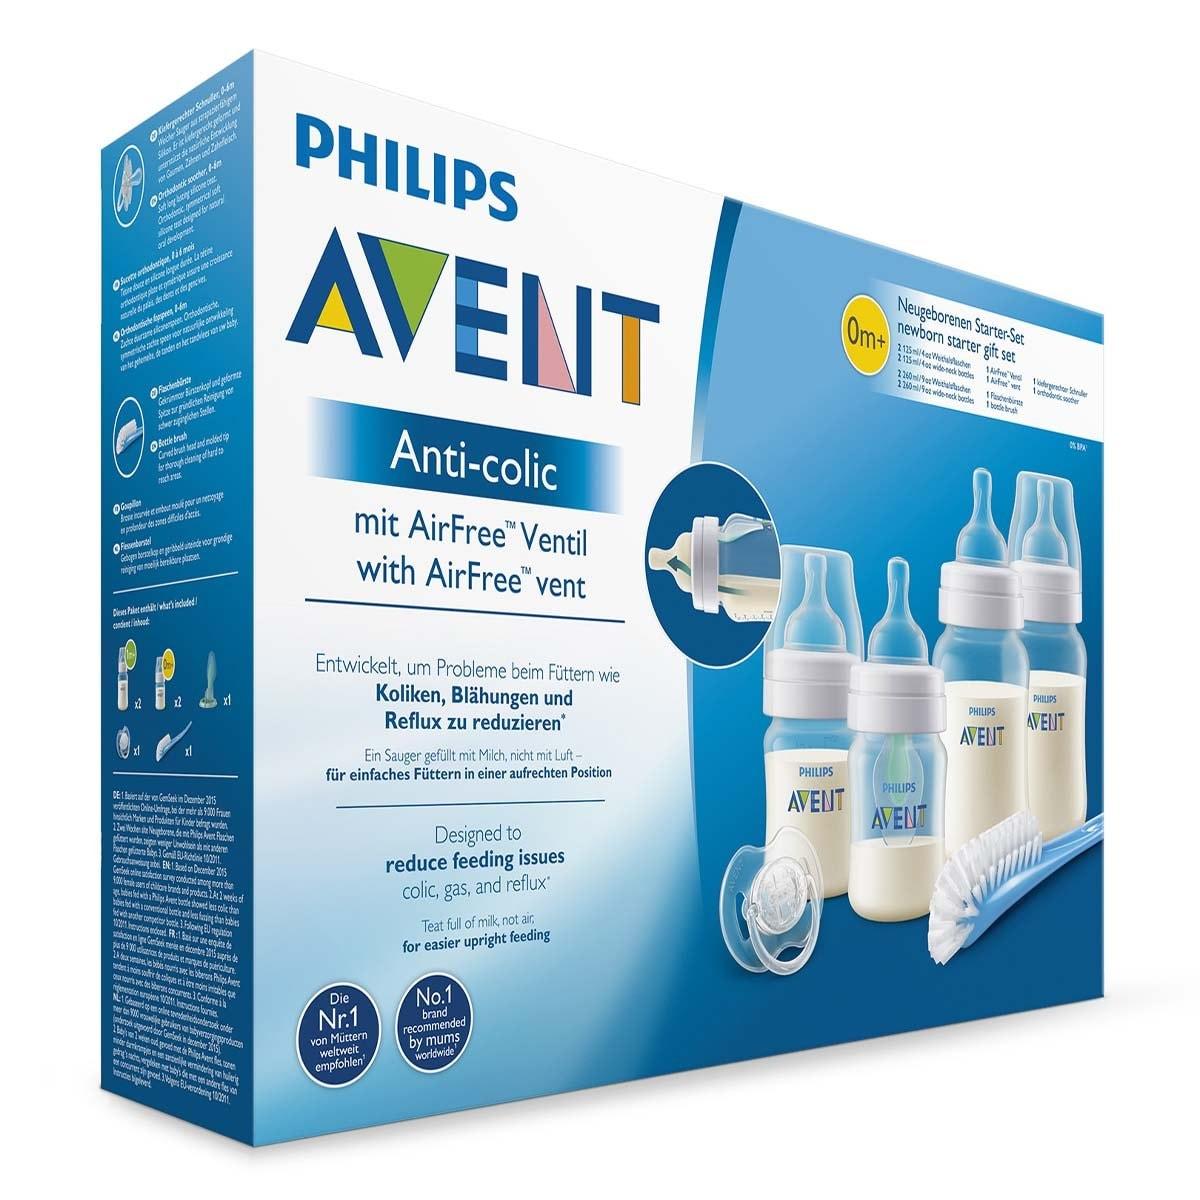 Set de Biberones Avent Anticolic con Sistema Antireflujo Airfree